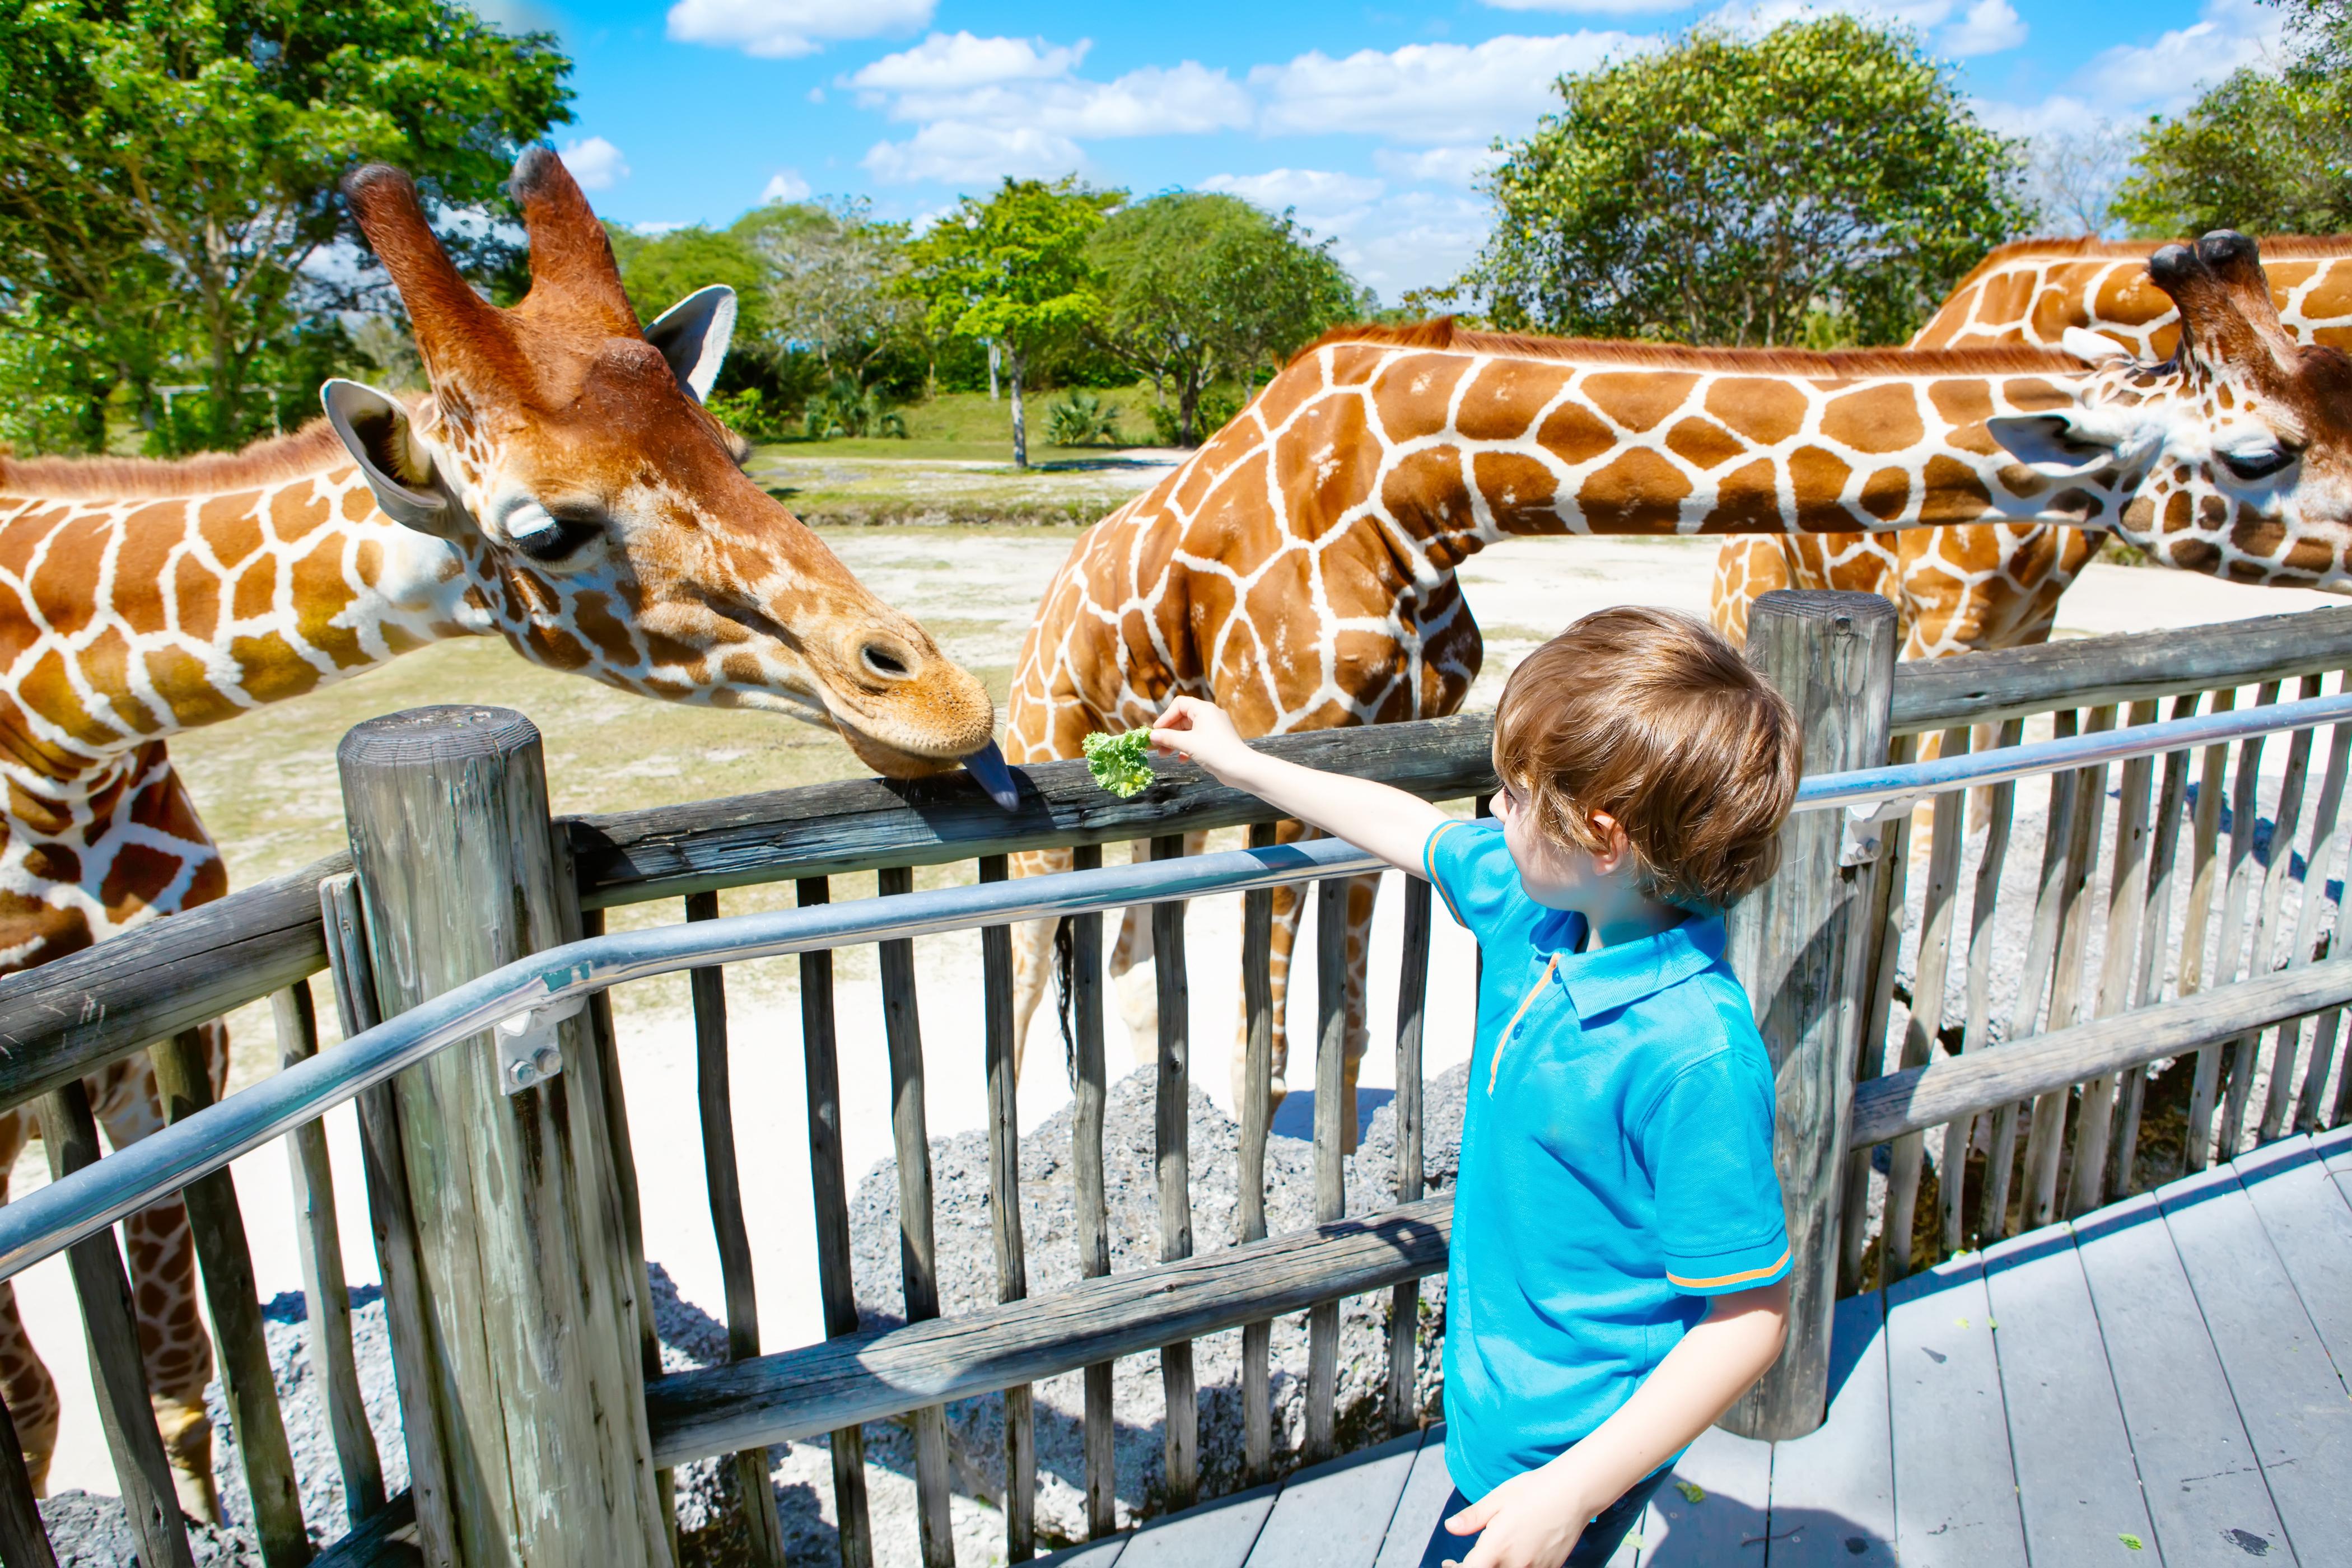 A boy feeds the giraffes at Zoo Miami.